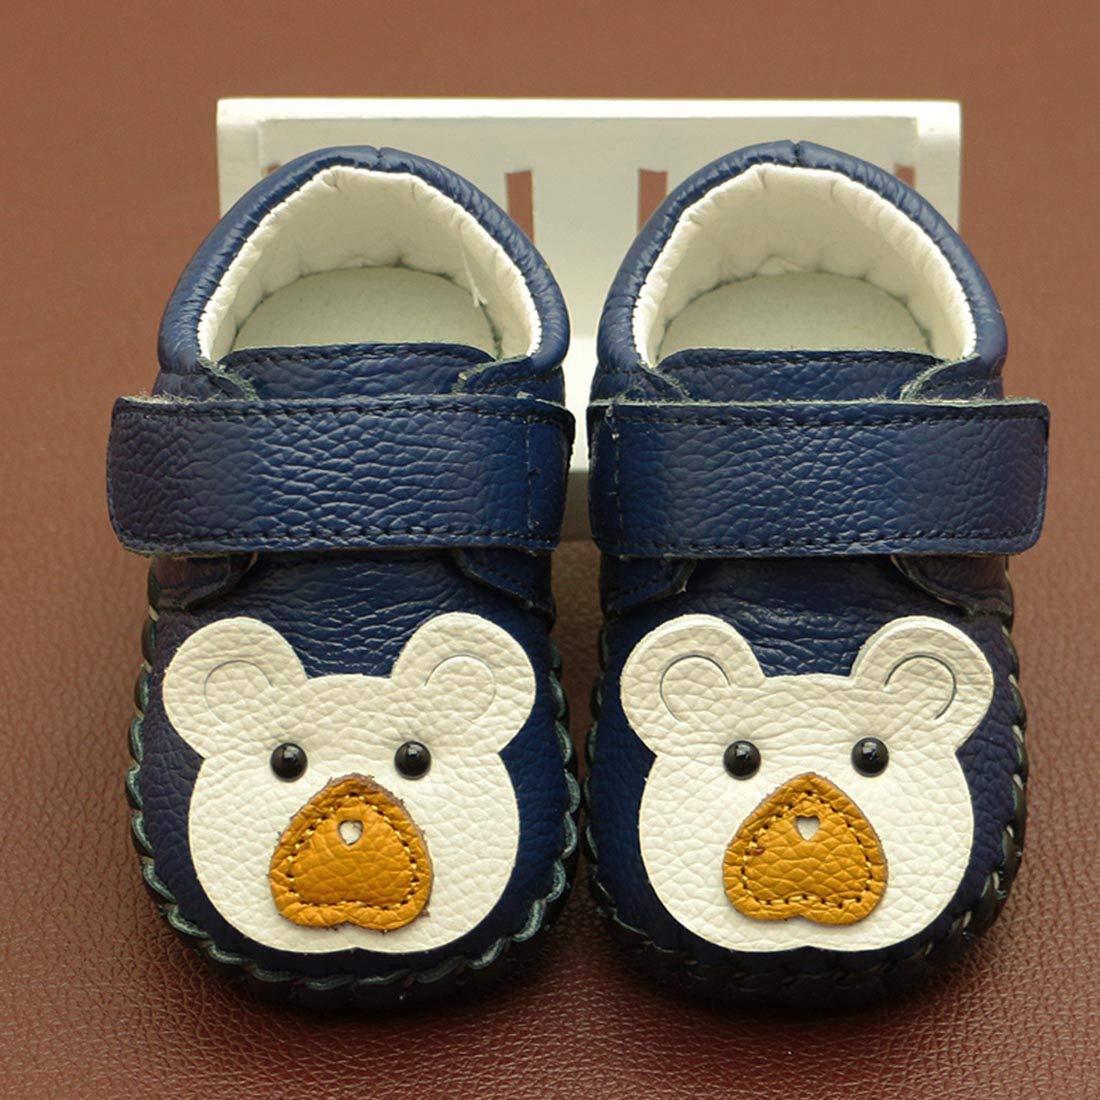 YIBLBOX Baby Non Slip Oxford Sole Cartoon Walking Slippers Crib Shoes Moccasins